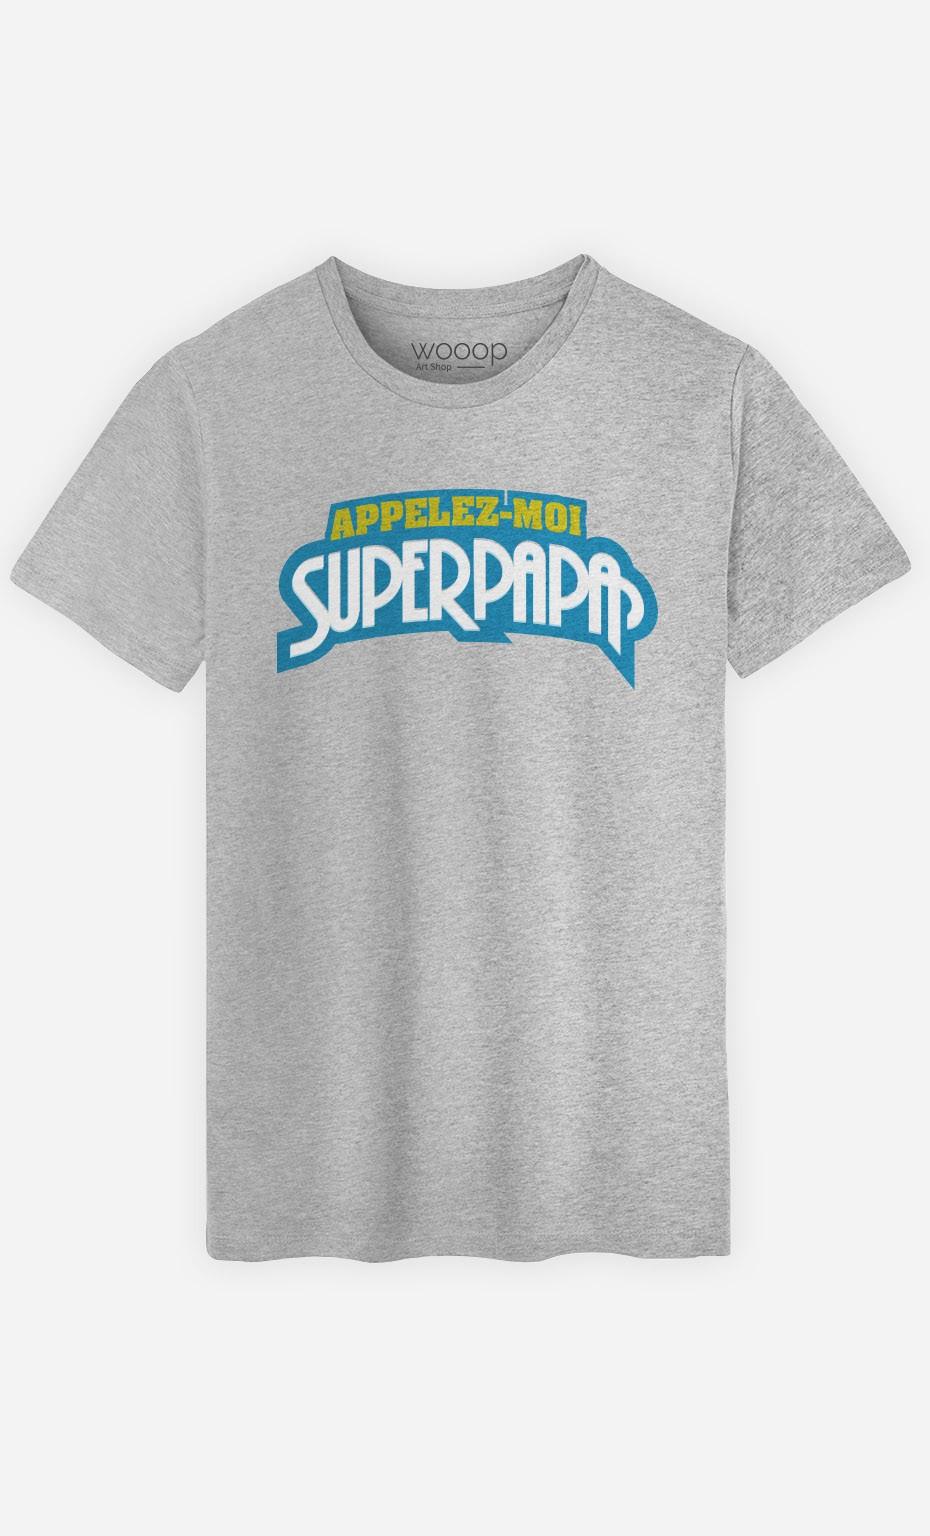 T-Shirt Appelez-Moi SuperPapa